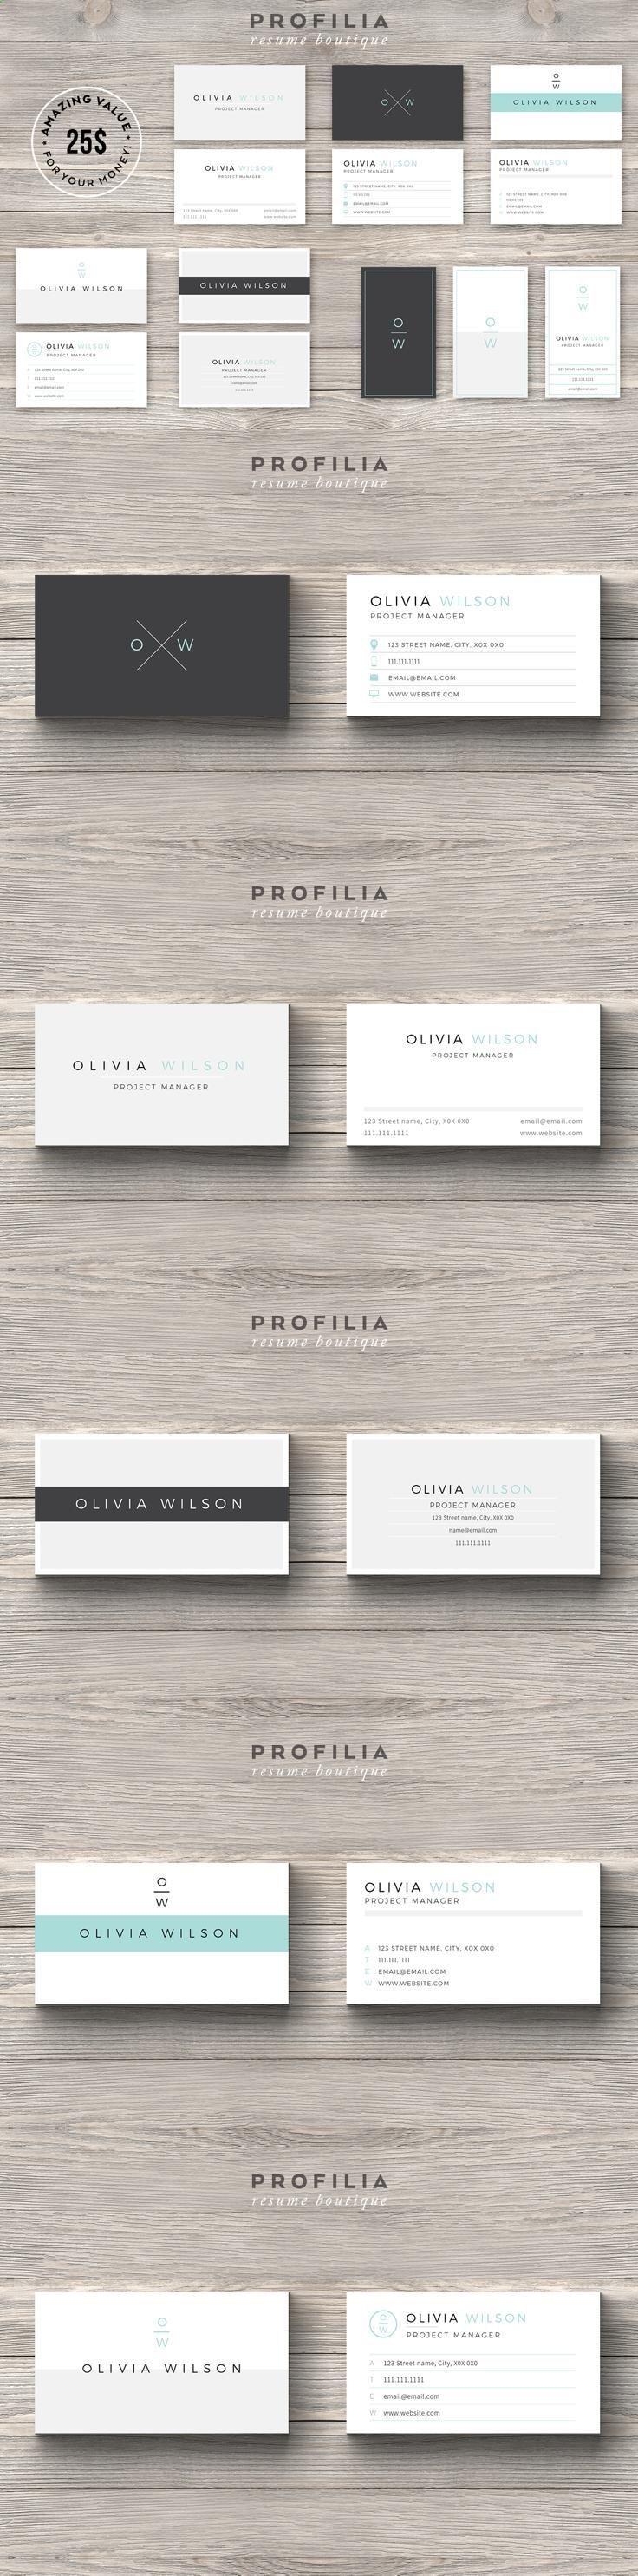 Businesscard Design From Profilia Resume Boutique Download Creativemarket Co Modern Business Cards Business Card Template Cool Business Cards